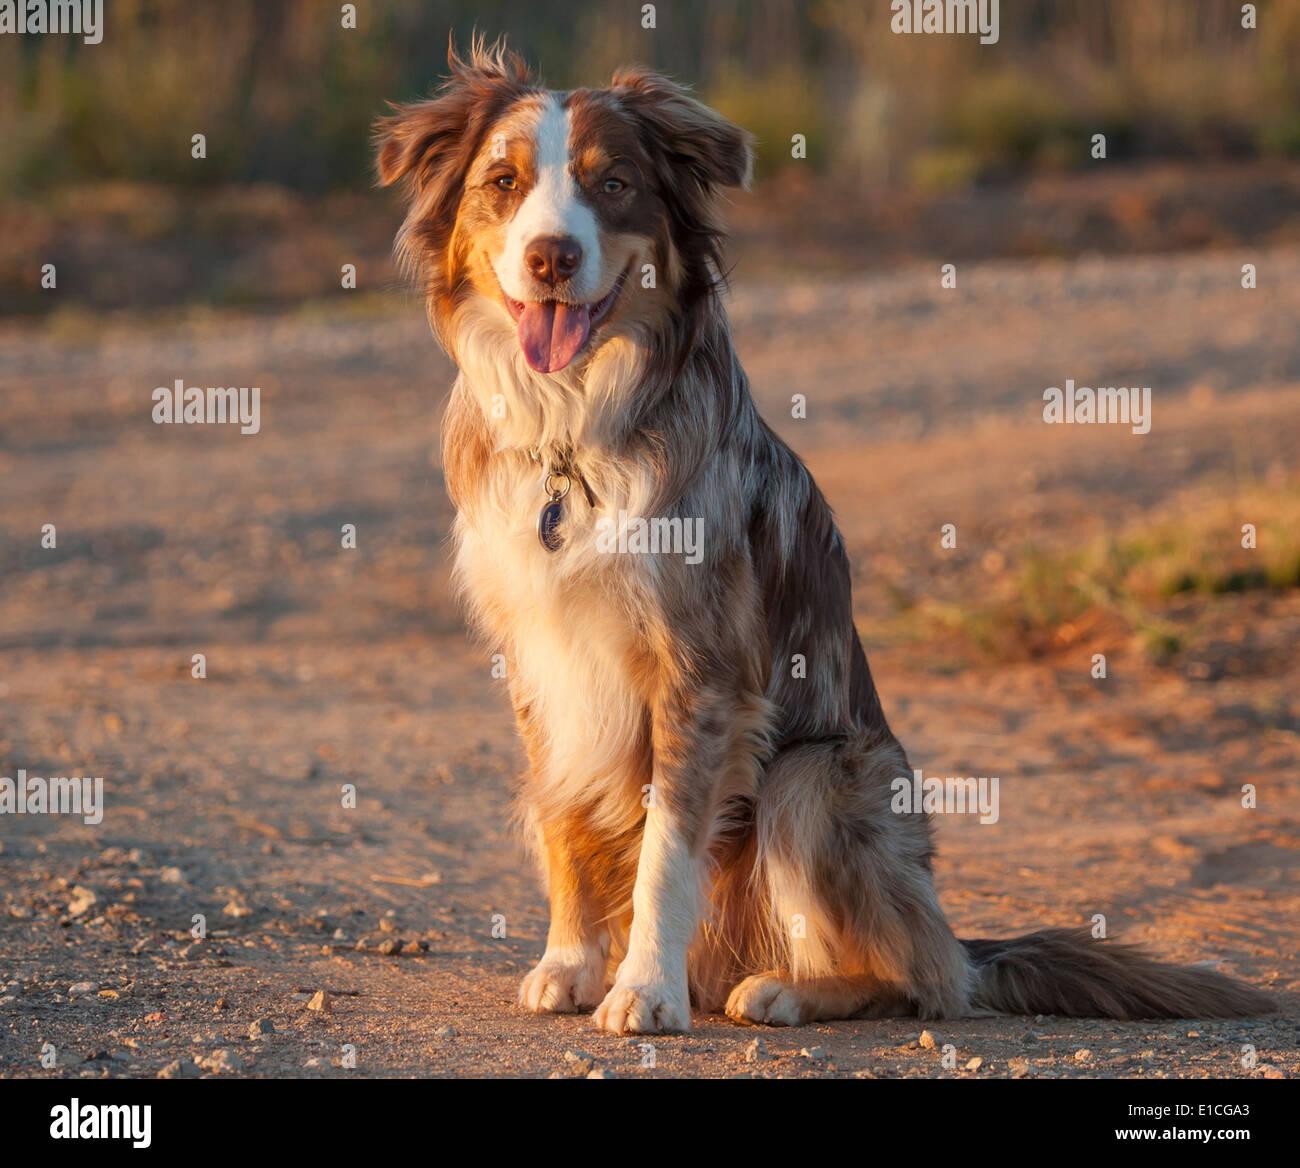 Mix Breed Dog Stock Photos & Mix Breed Dog Stock Images - Alamy